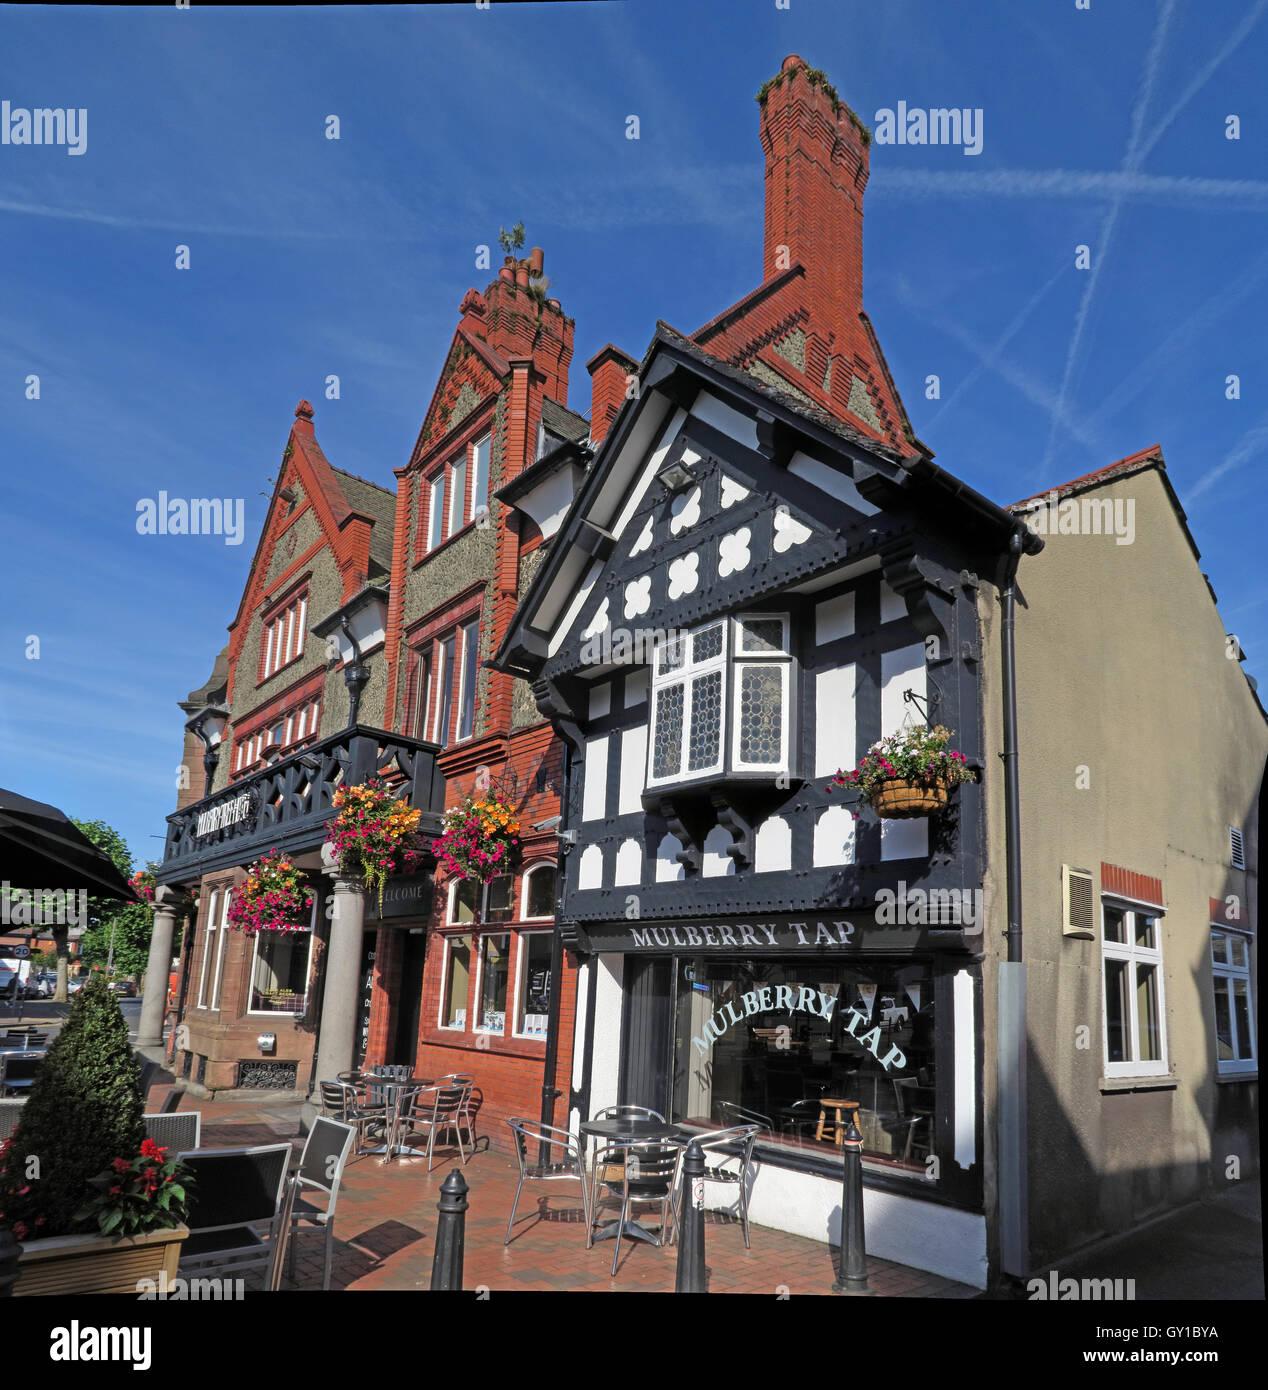 Mulberry Tree Pub,Stockton Heath,South Warrington,Cheshire,England,UK - Stock Image